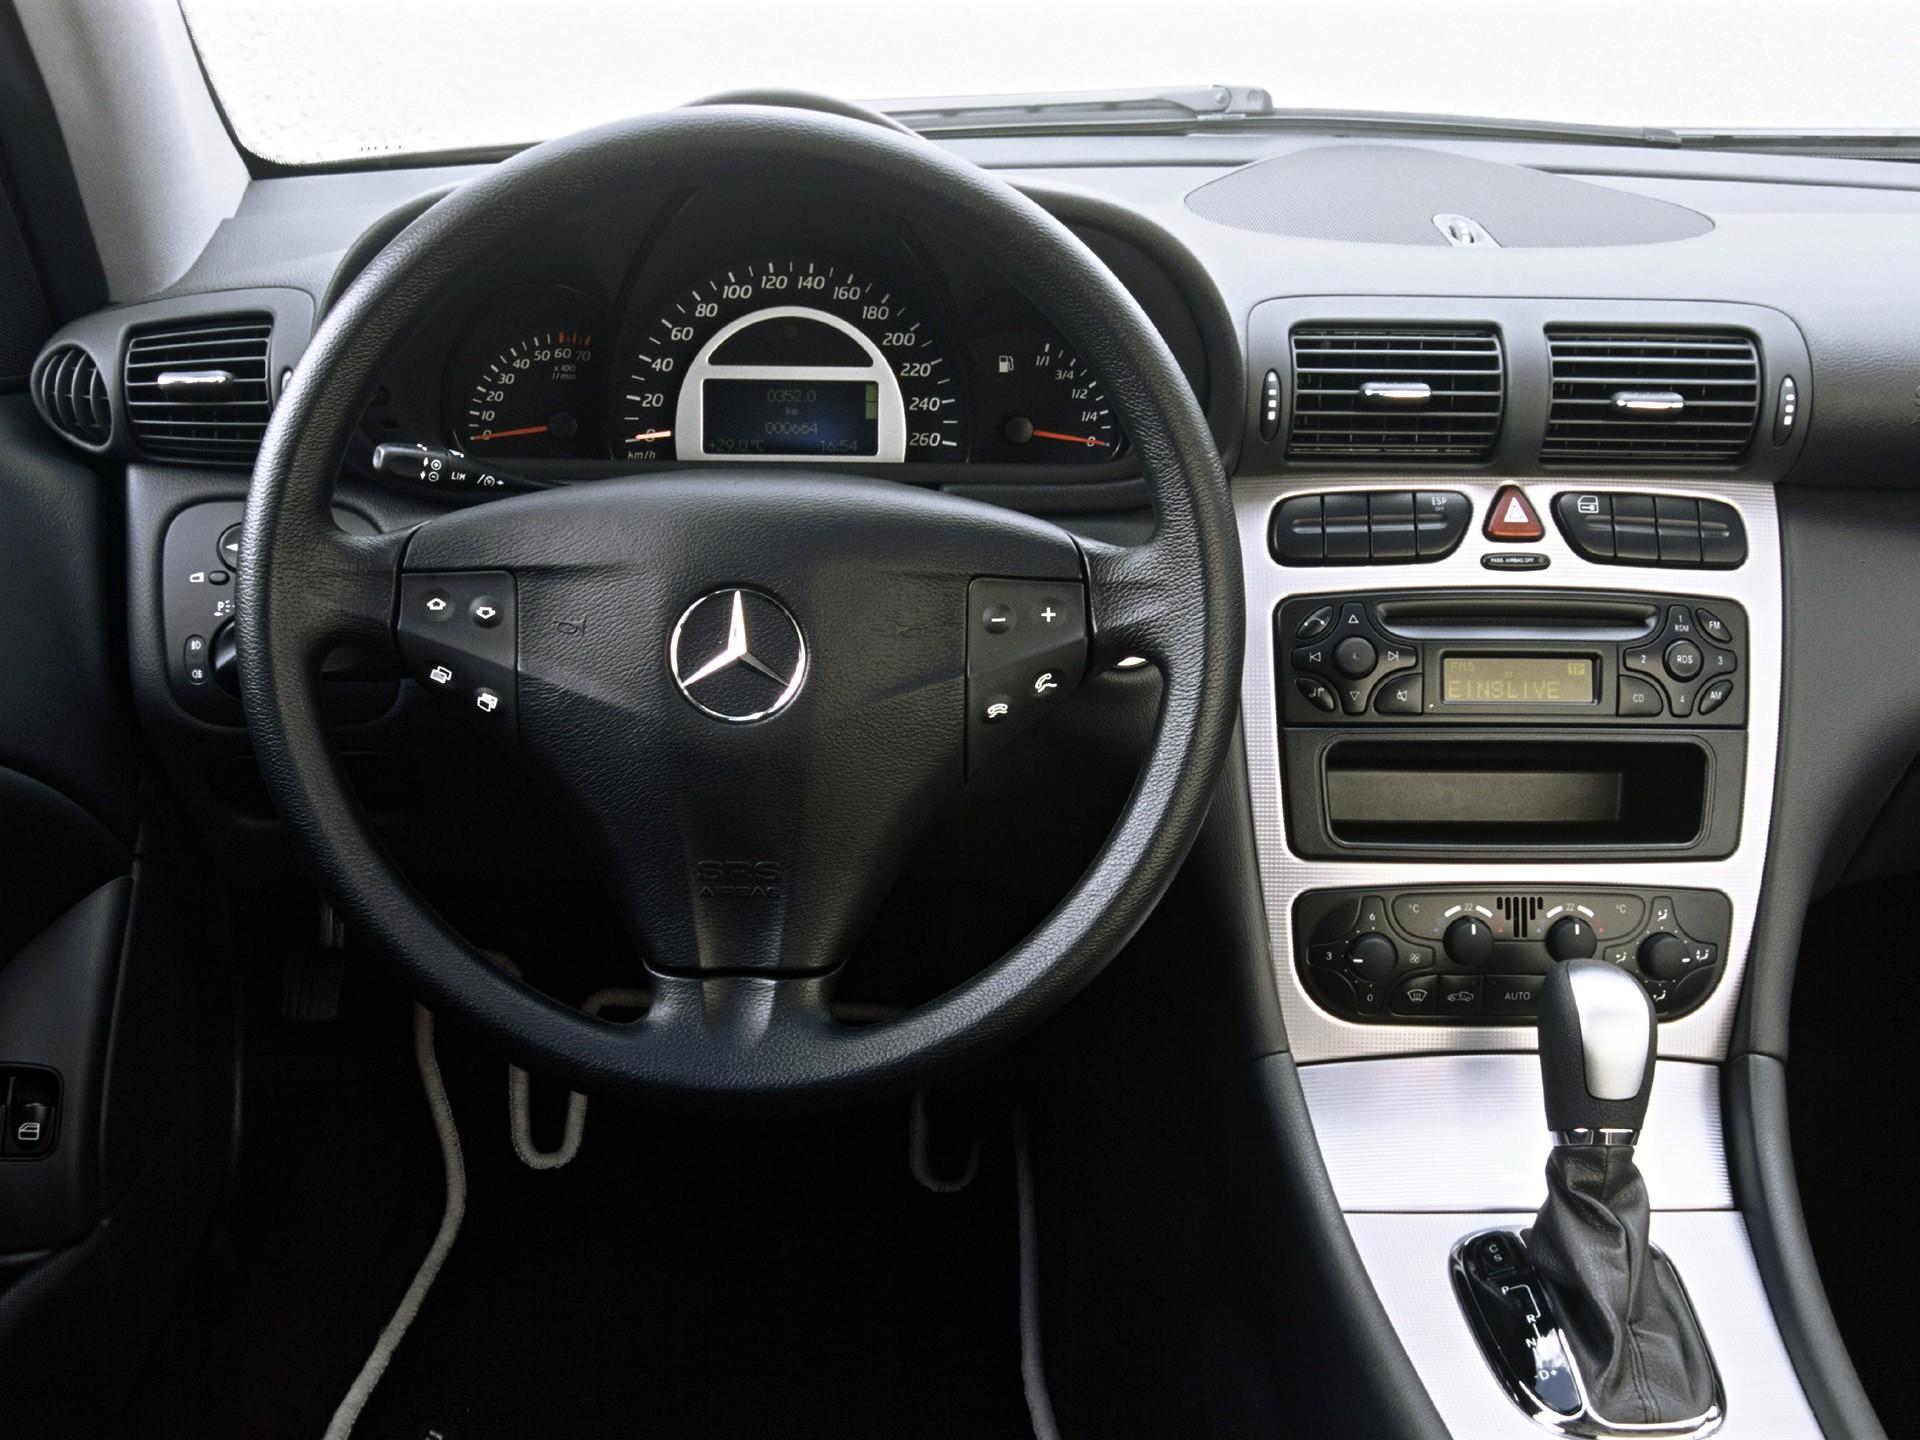 Mercedes benz c klasse sportcoupe amg c203 specs 2000 for Mercedes benz c30